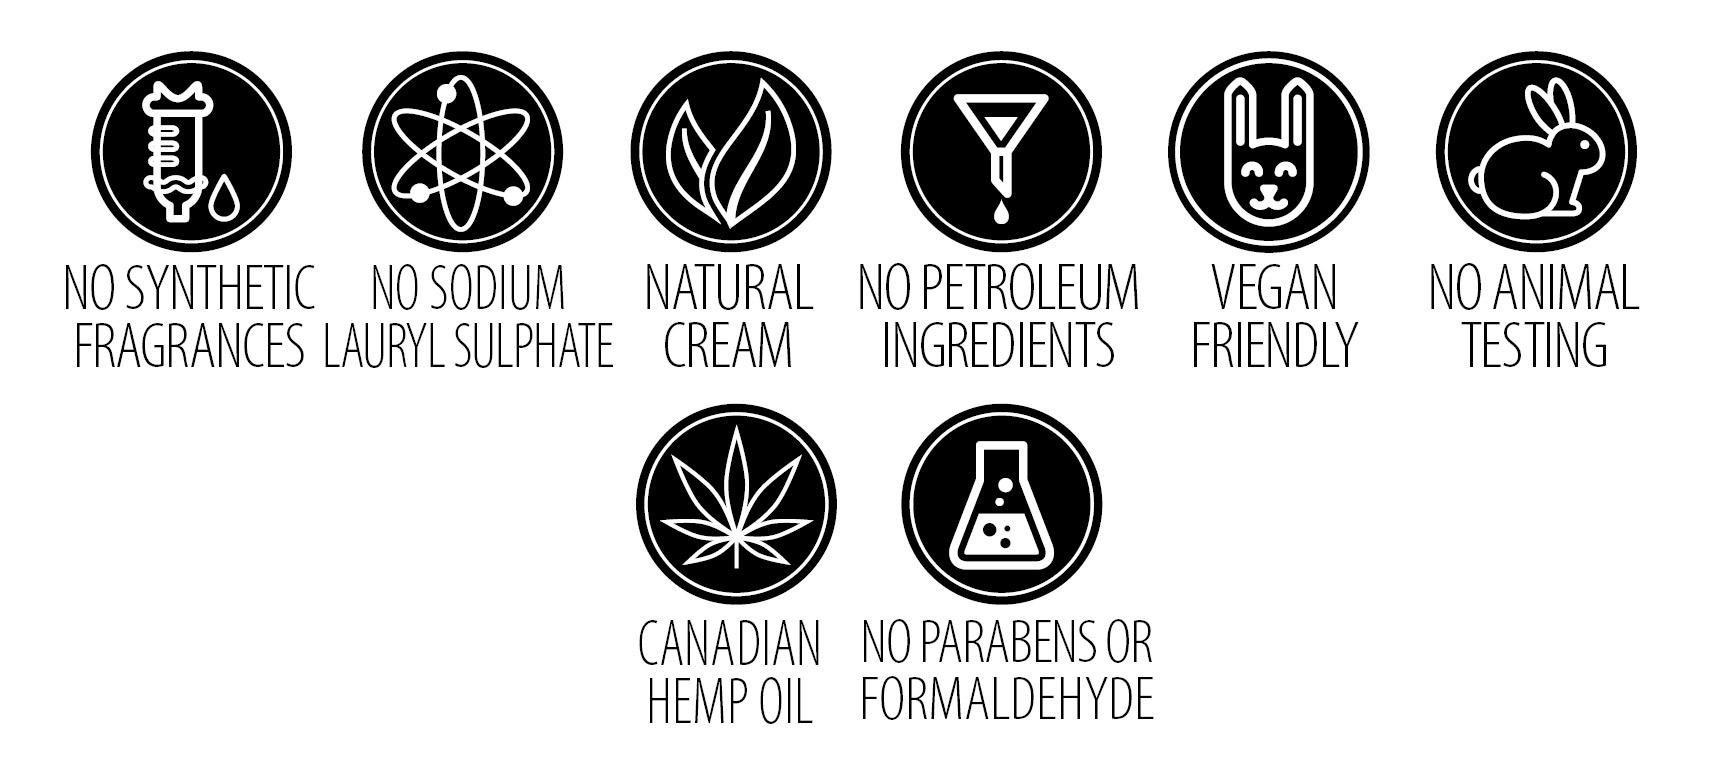 Natural MSM Soothe Cream – Awaken Within -100g – Gentle